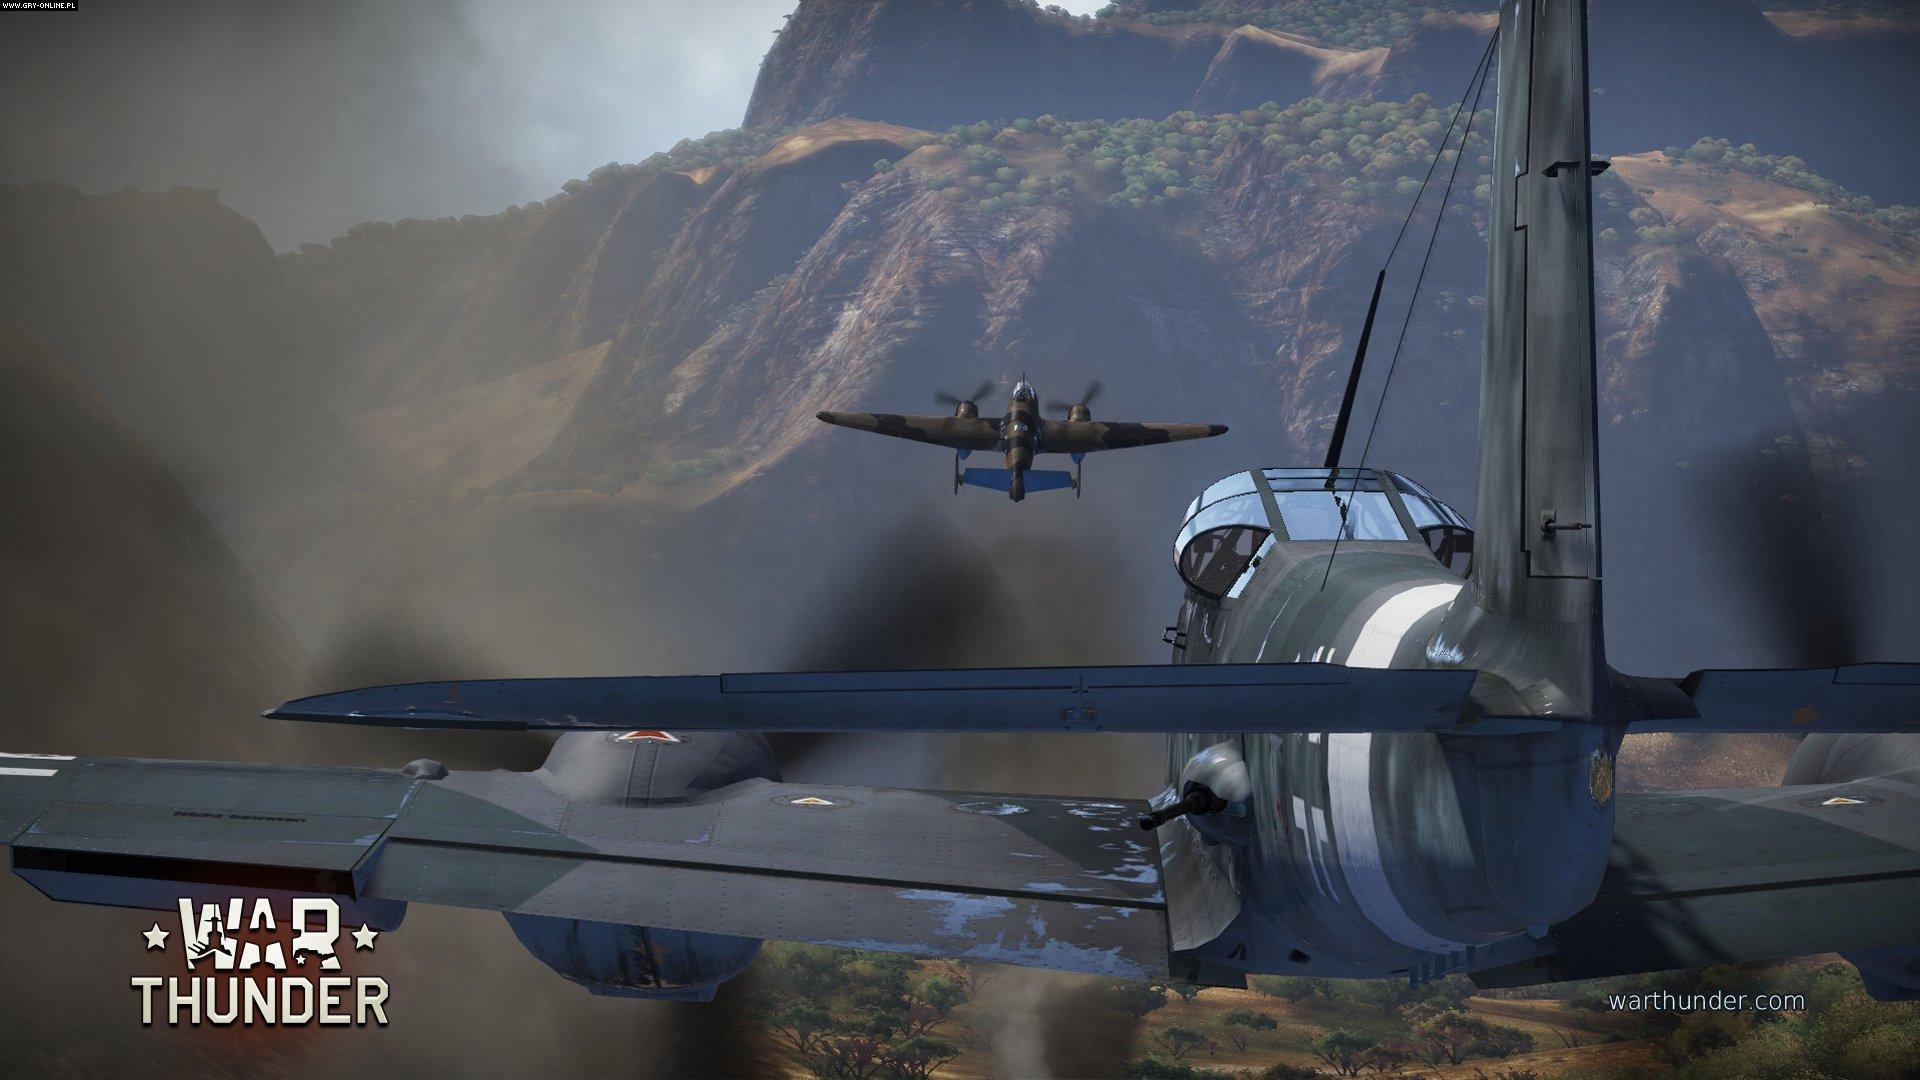 War Thunder HD Wallpaper | Background Image | 1920x1080 | ID:452469 - Wallpaper Abyss